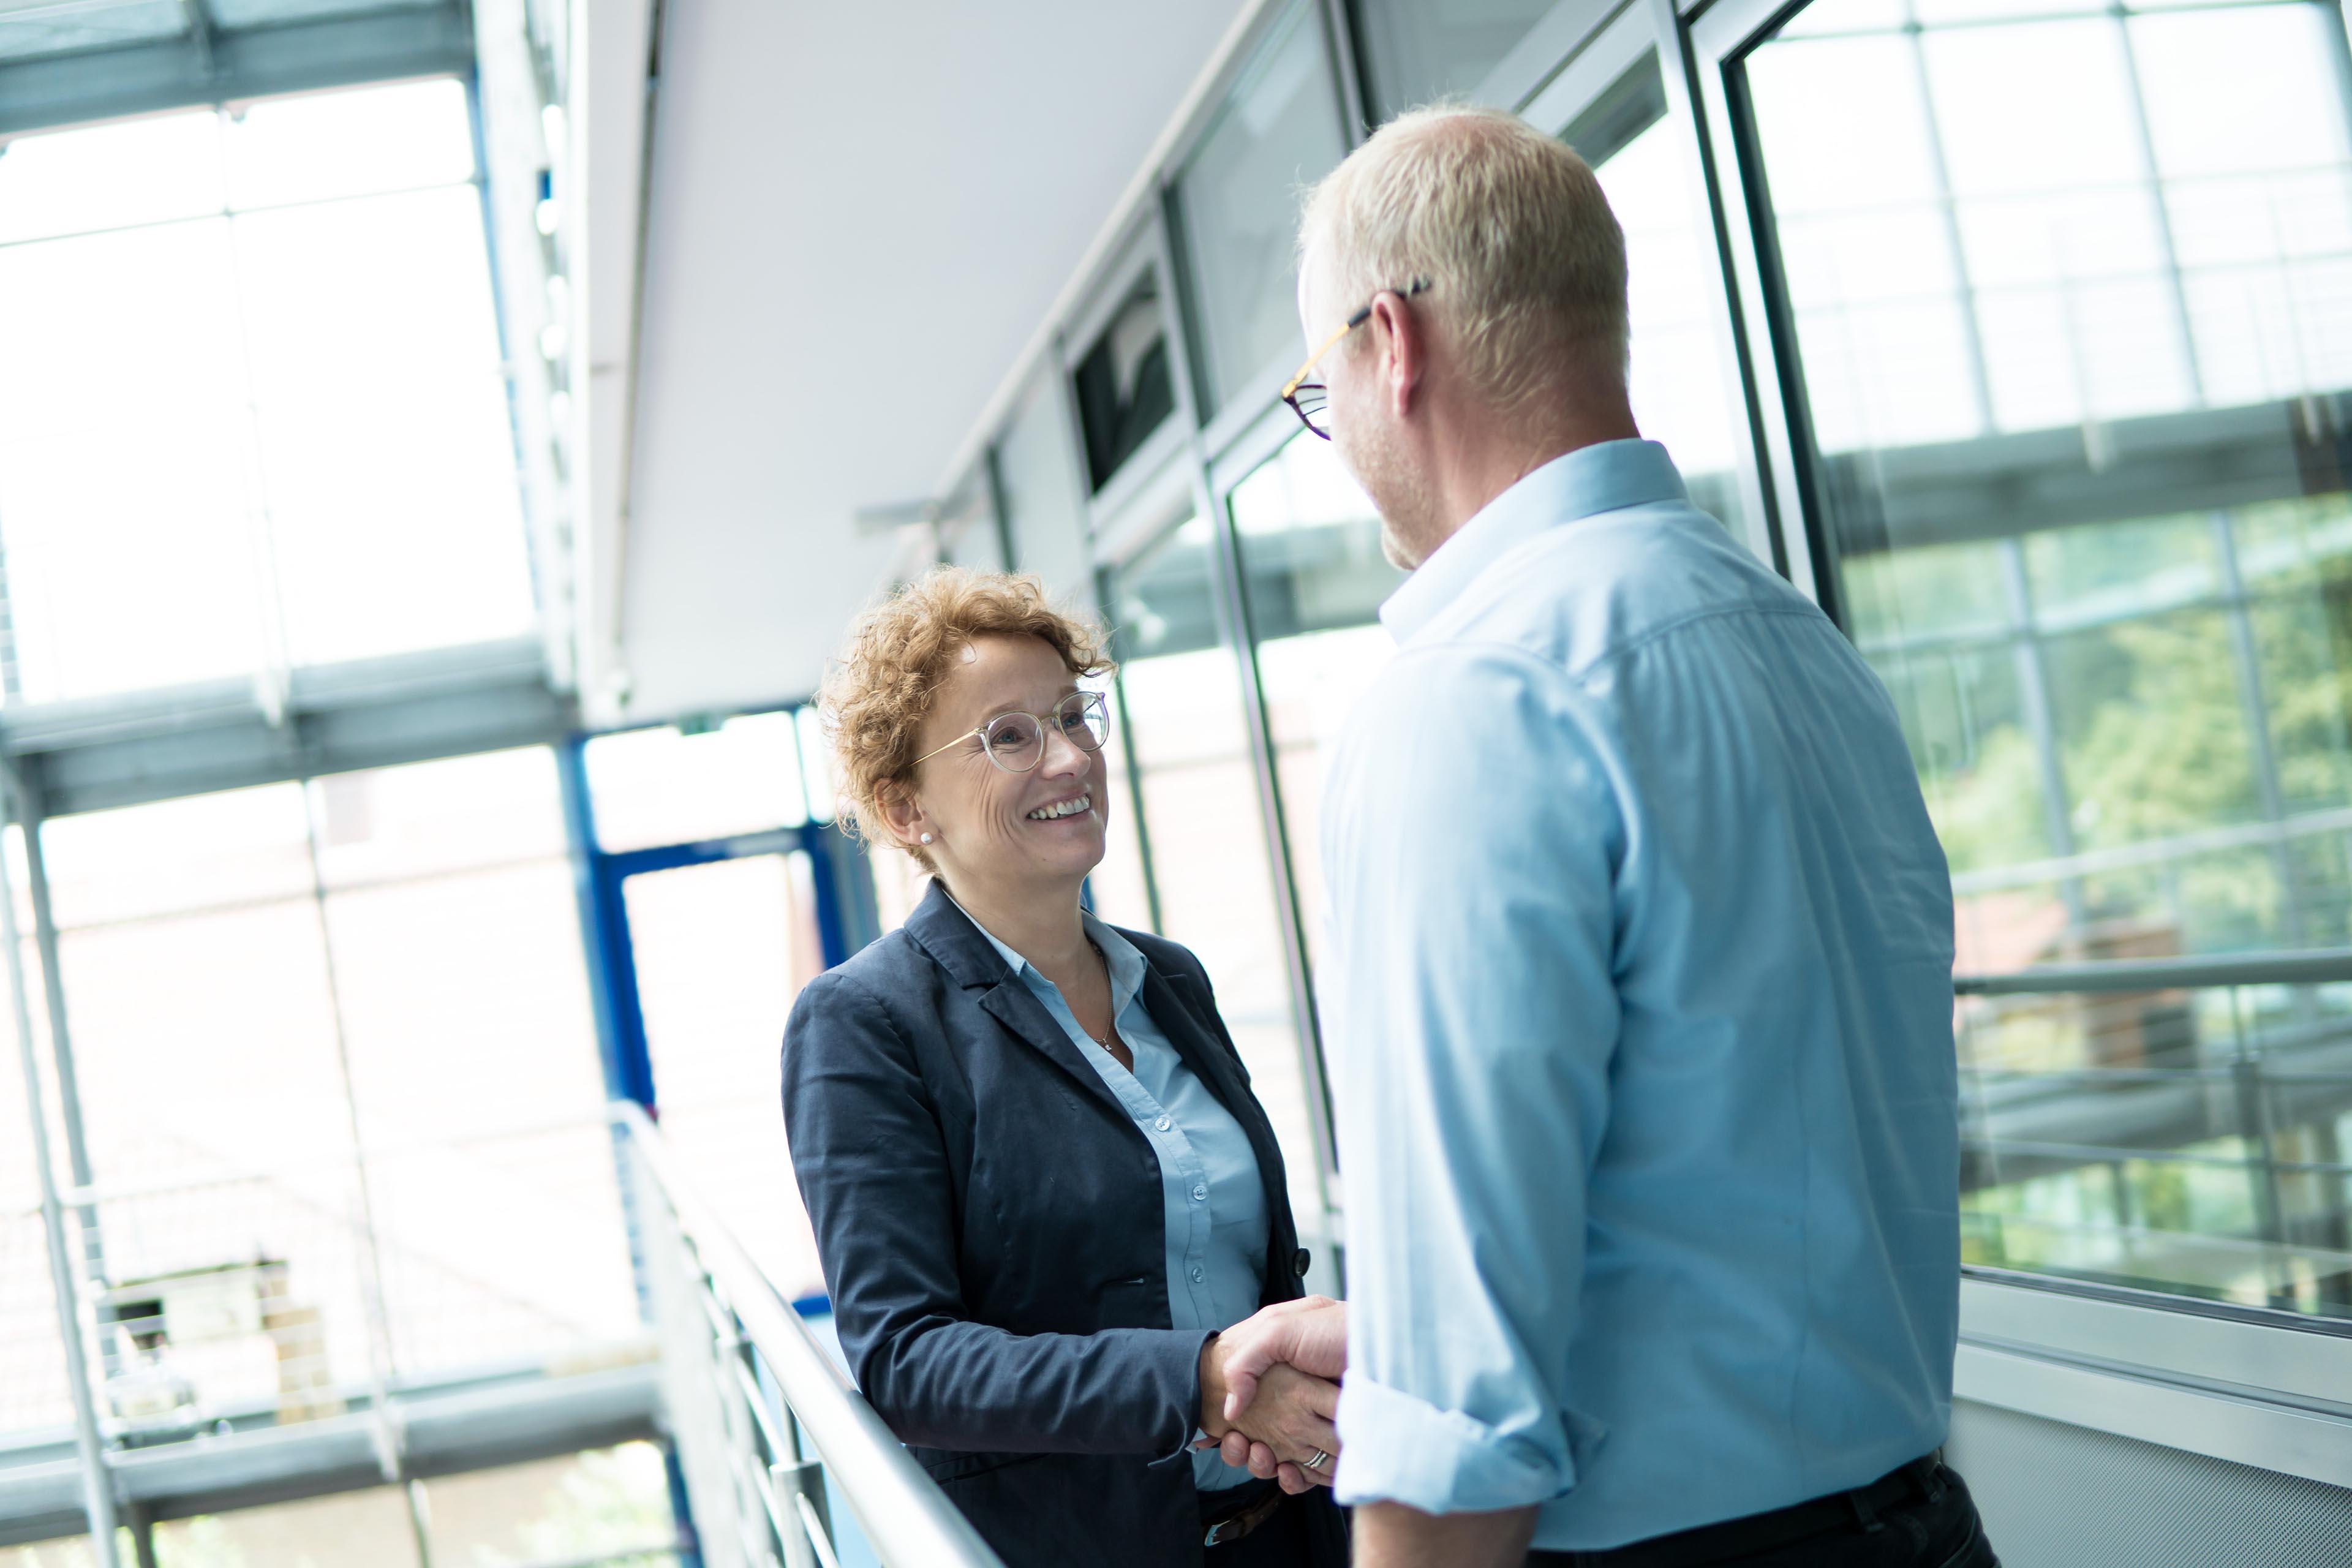 Maike Grünebaum Consulting | Im Kundengespräch